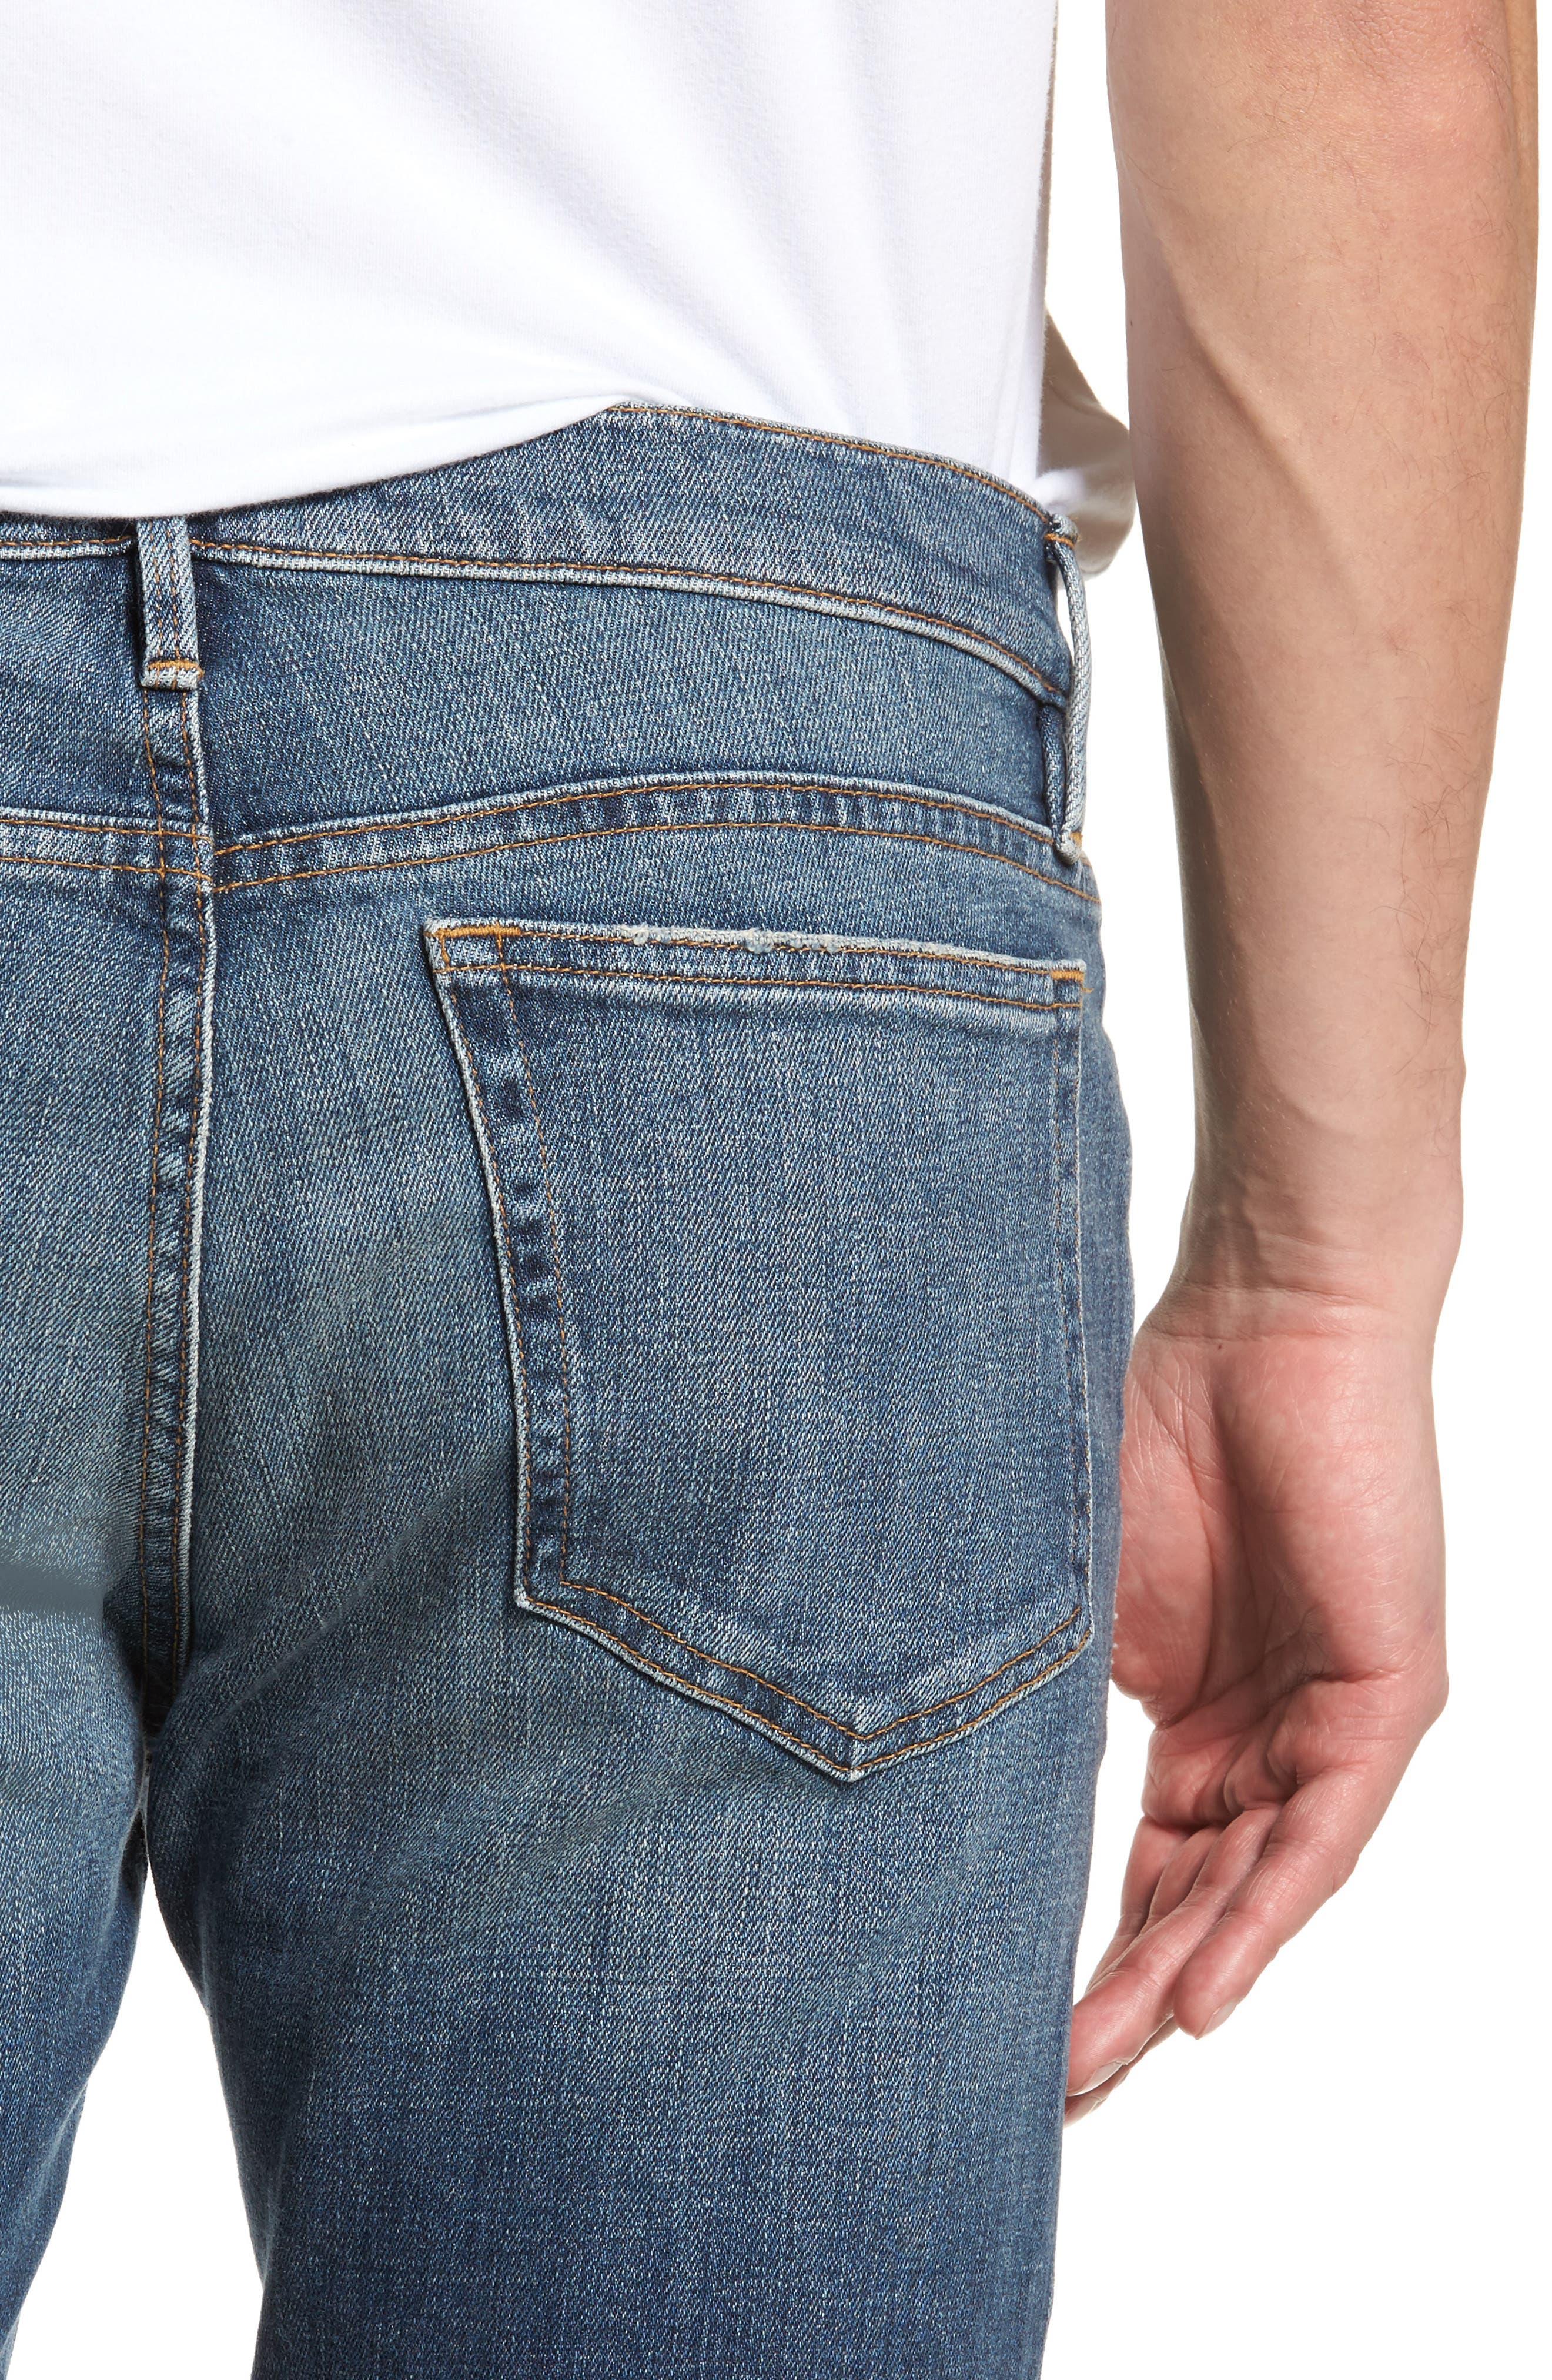 L'Homme Skinny Fit Jeans,                             Alternate thumbnail 4, color,                             405